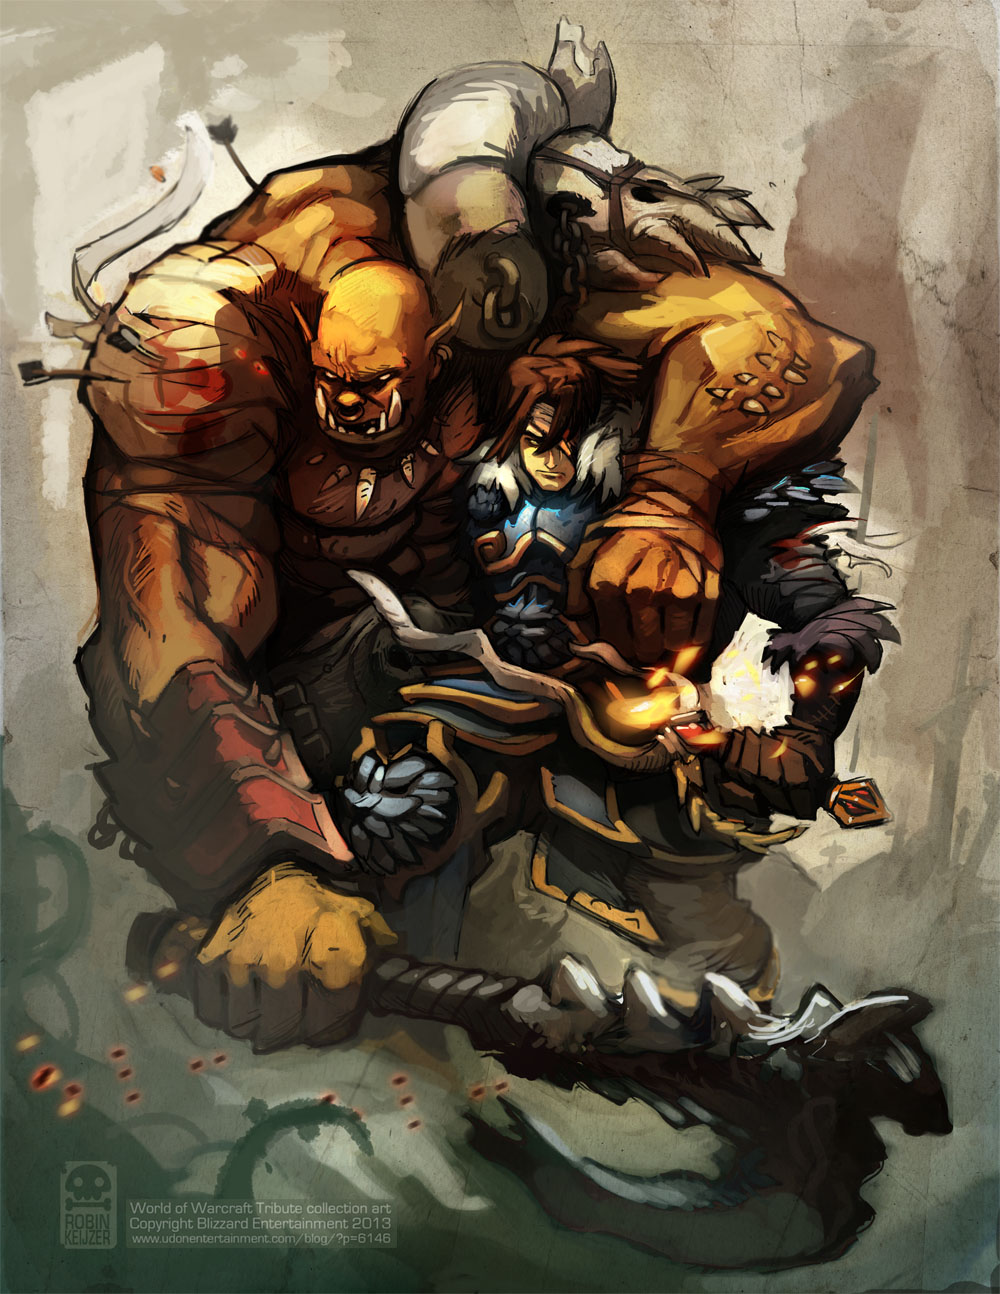 World of Warcraft Tribute Art by RobinKeijzer